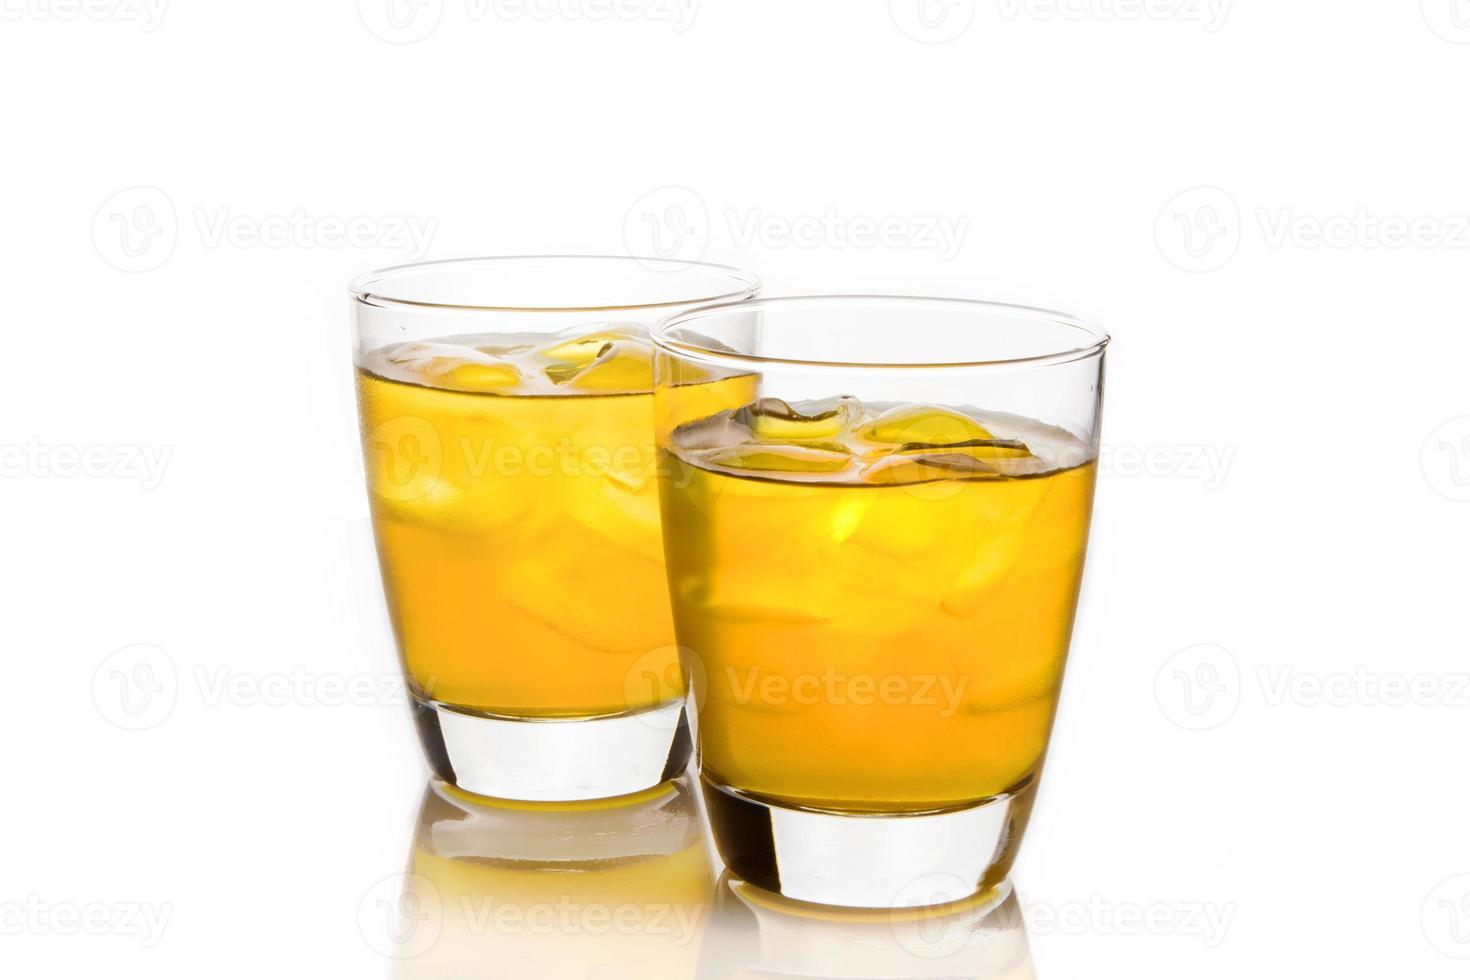 bebida à base de crisântemo, foto